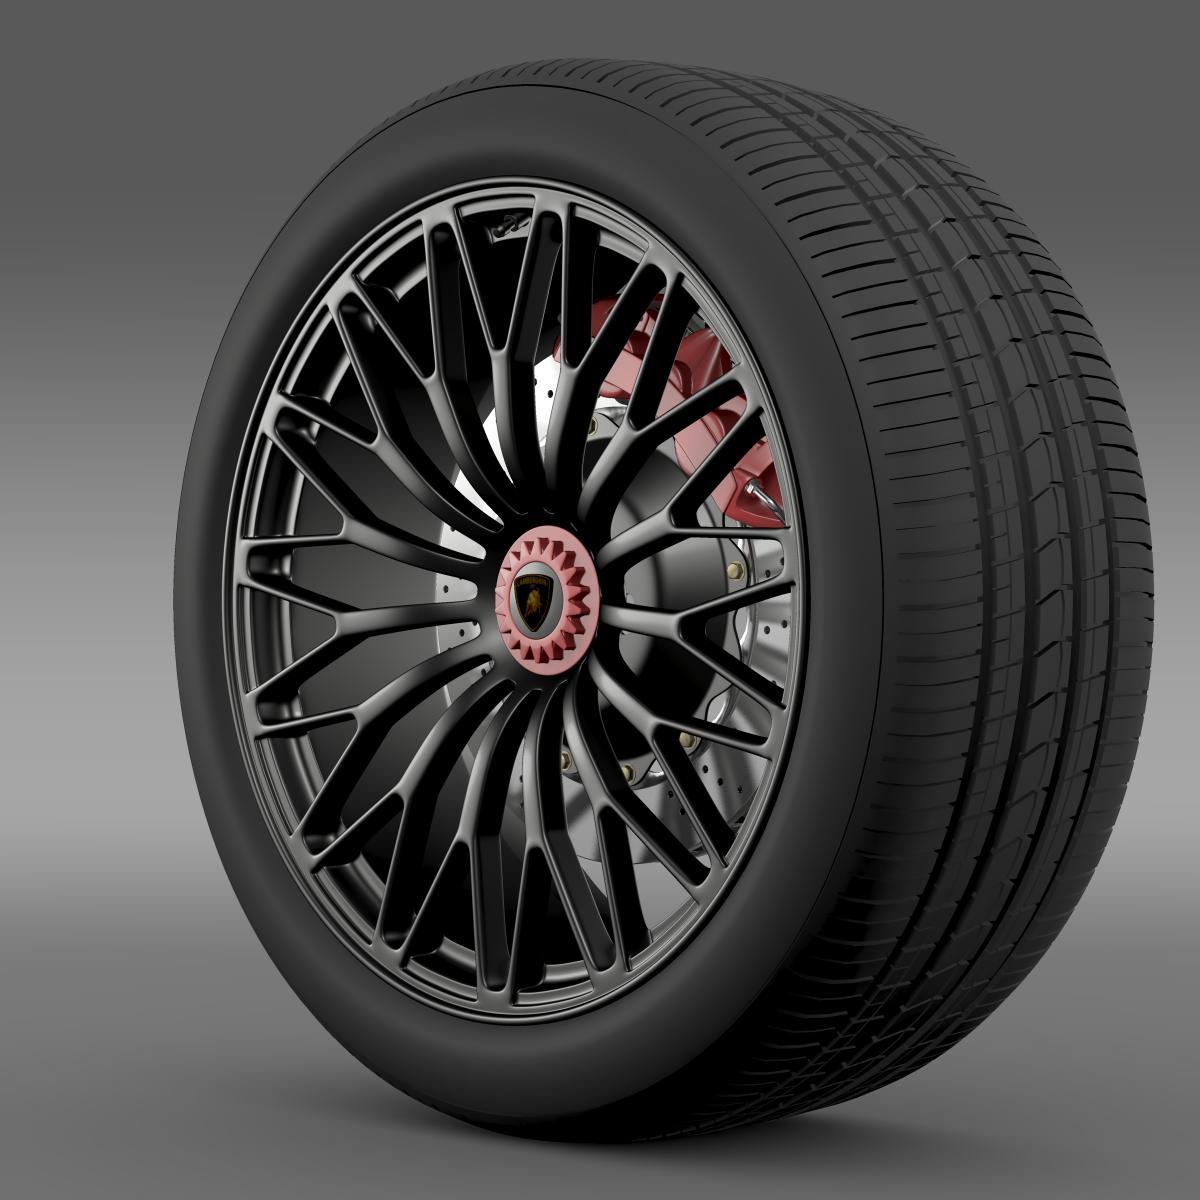 lamborghini aventador lp 750 4 sv wheel 3d model 3ds max fbx c4d lwo ma mb hrc xsi obj 210712